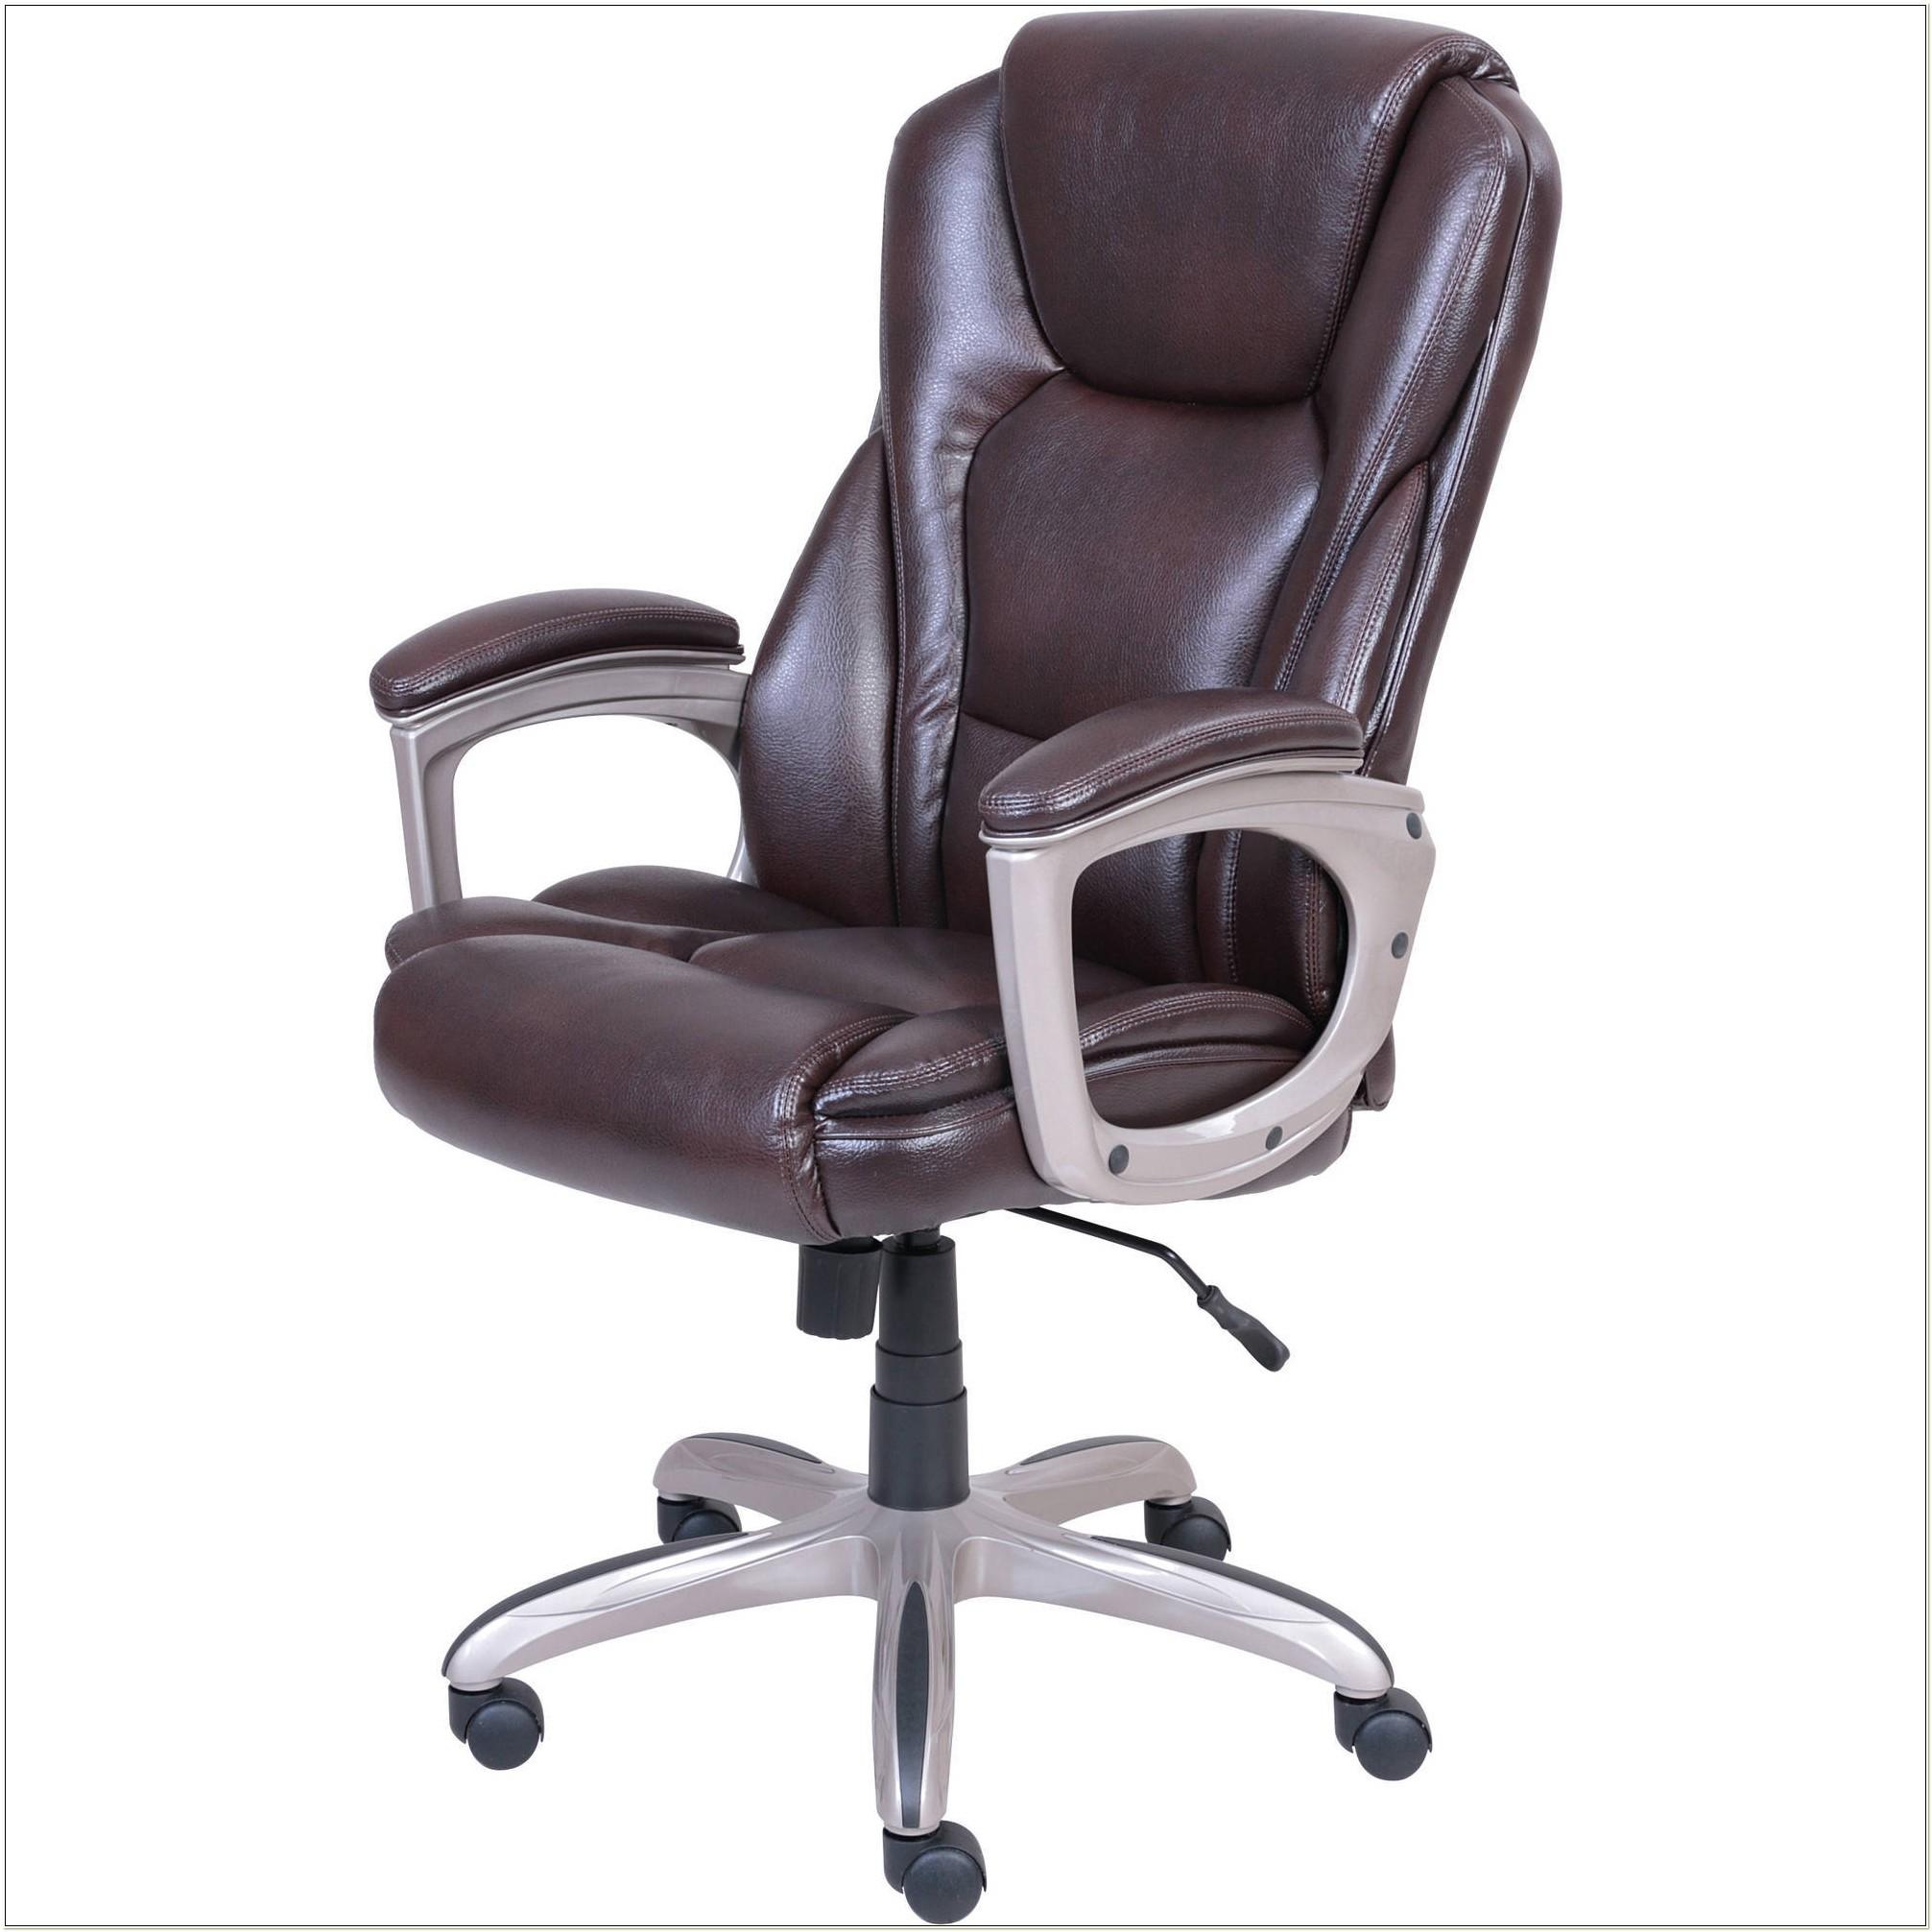 Serta Big Tall Executive Leather Chair